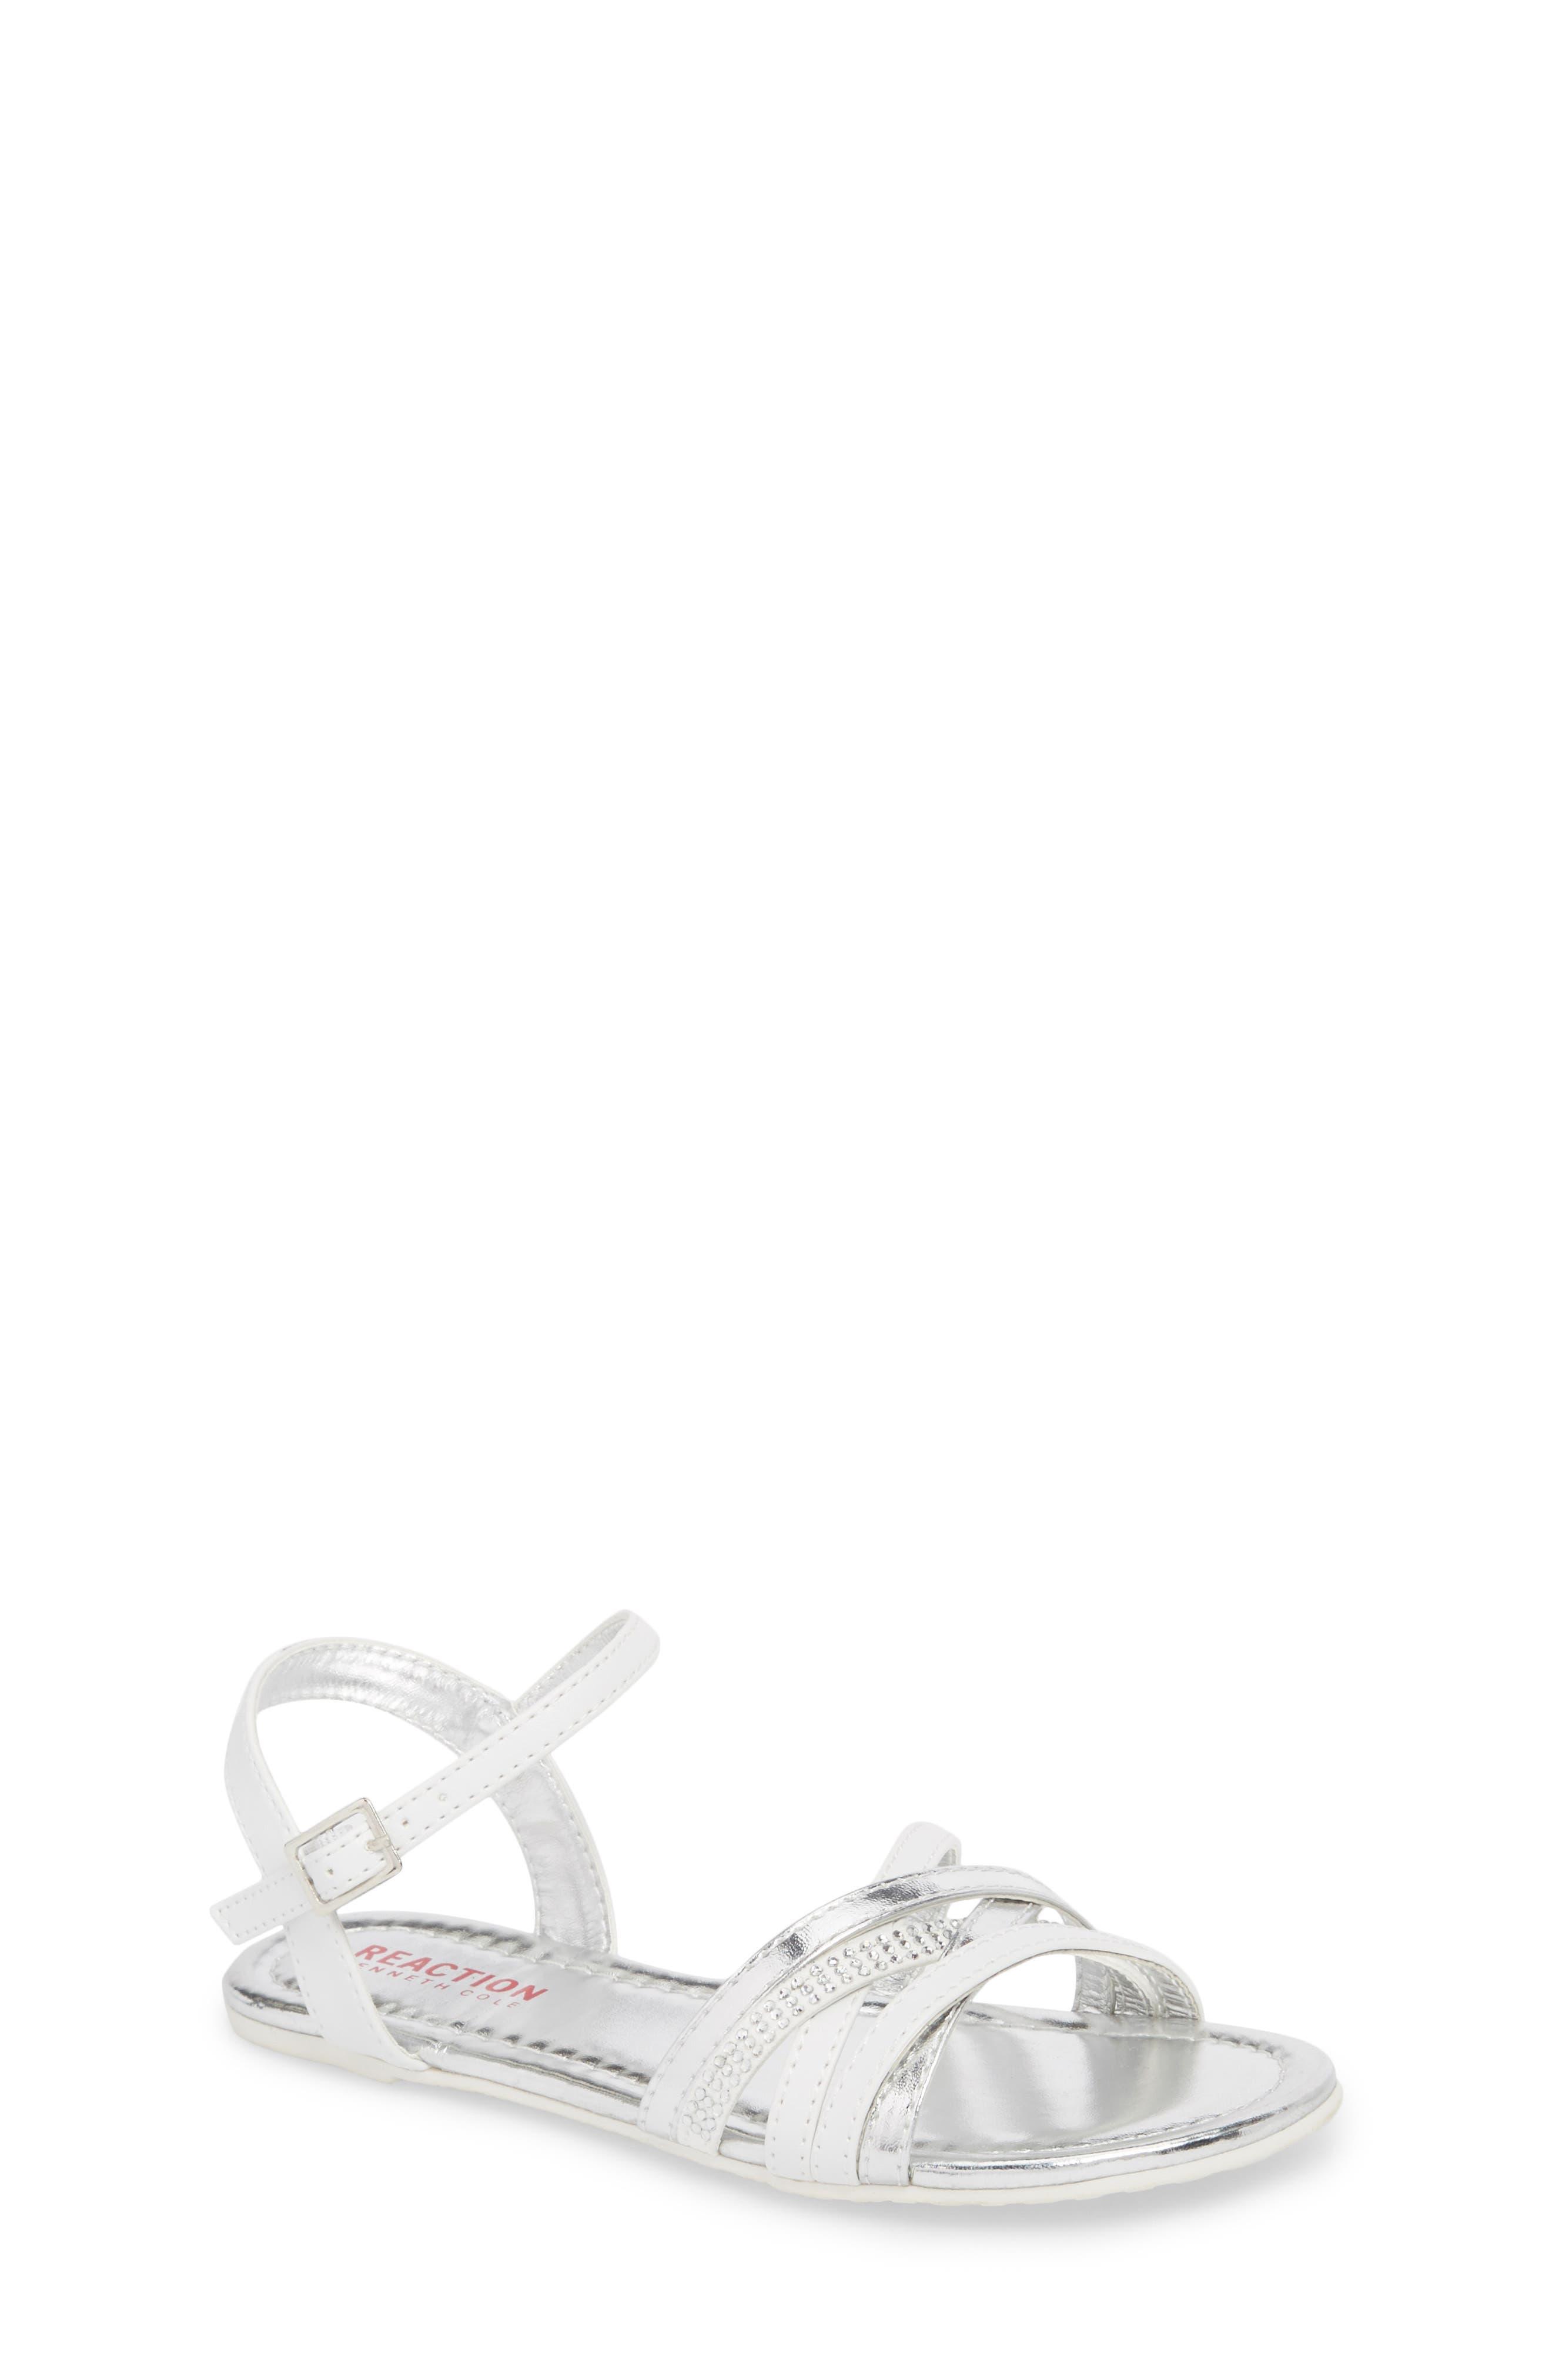 Kiera Getty Crystal Sandal,                         Main,                         color, White